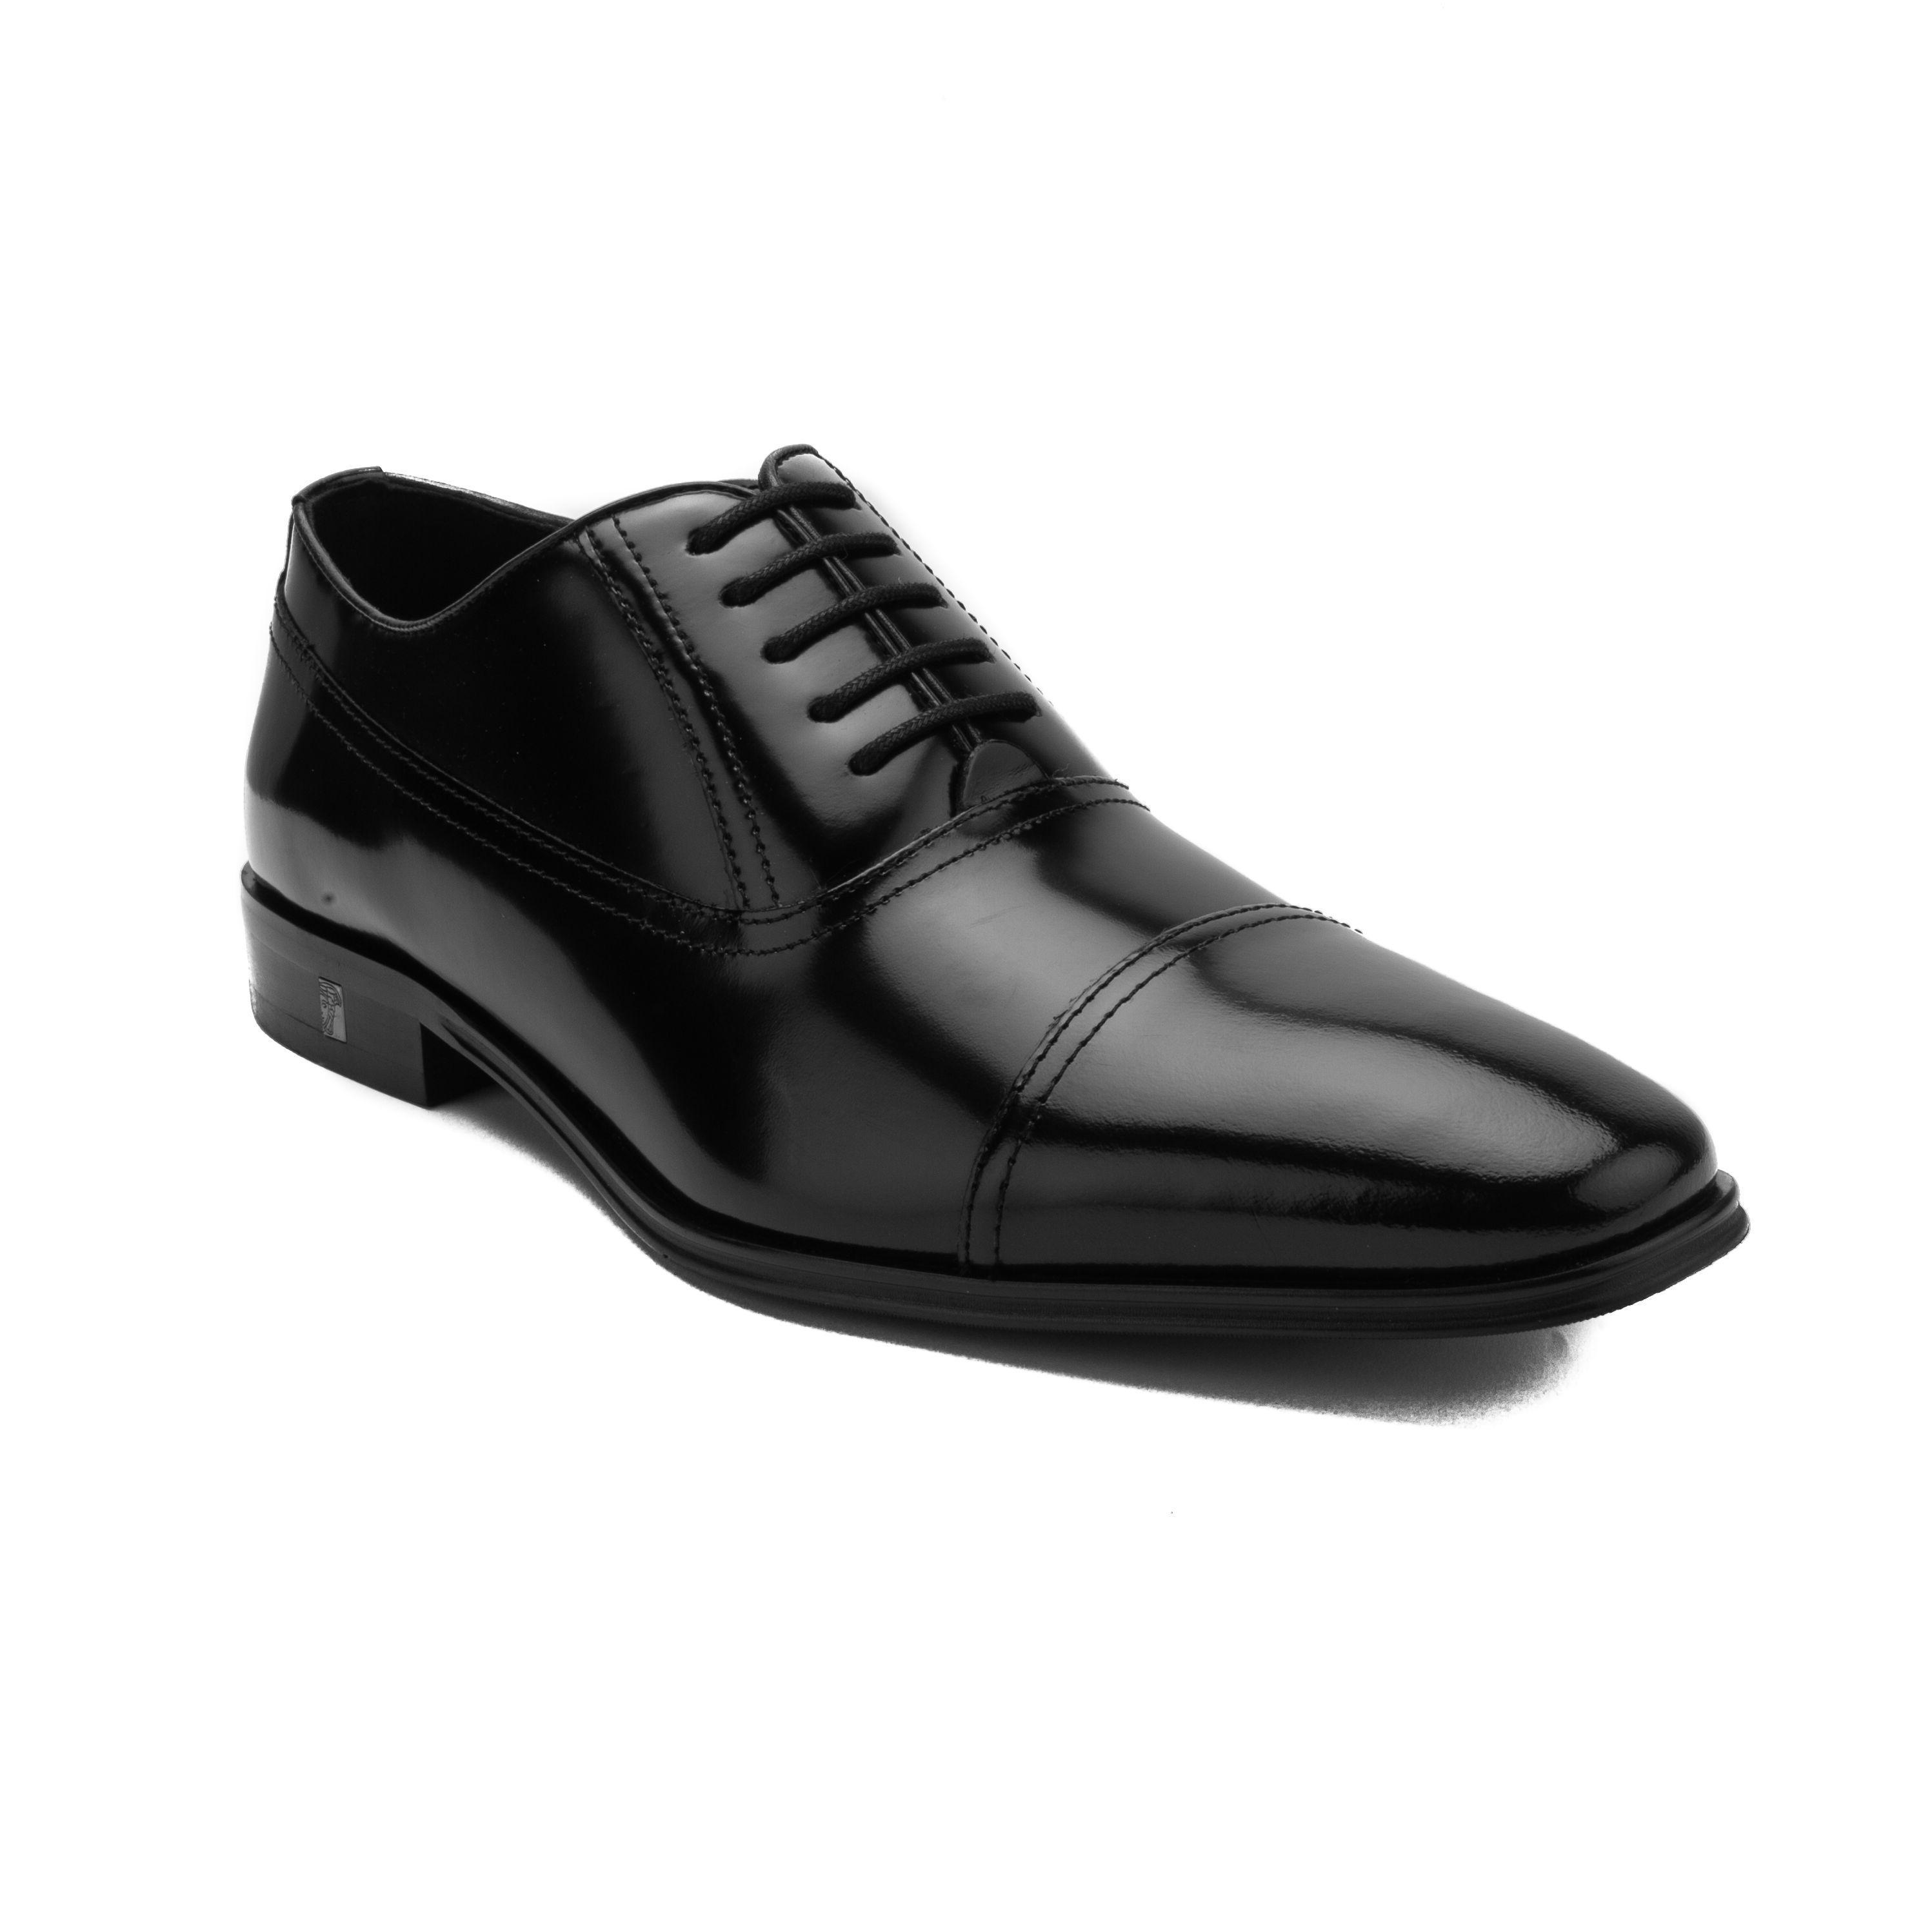 50190a0ec3 Versace Dress Patent Oxford Men's Lyst Collection Shoes Leather wnPOk0